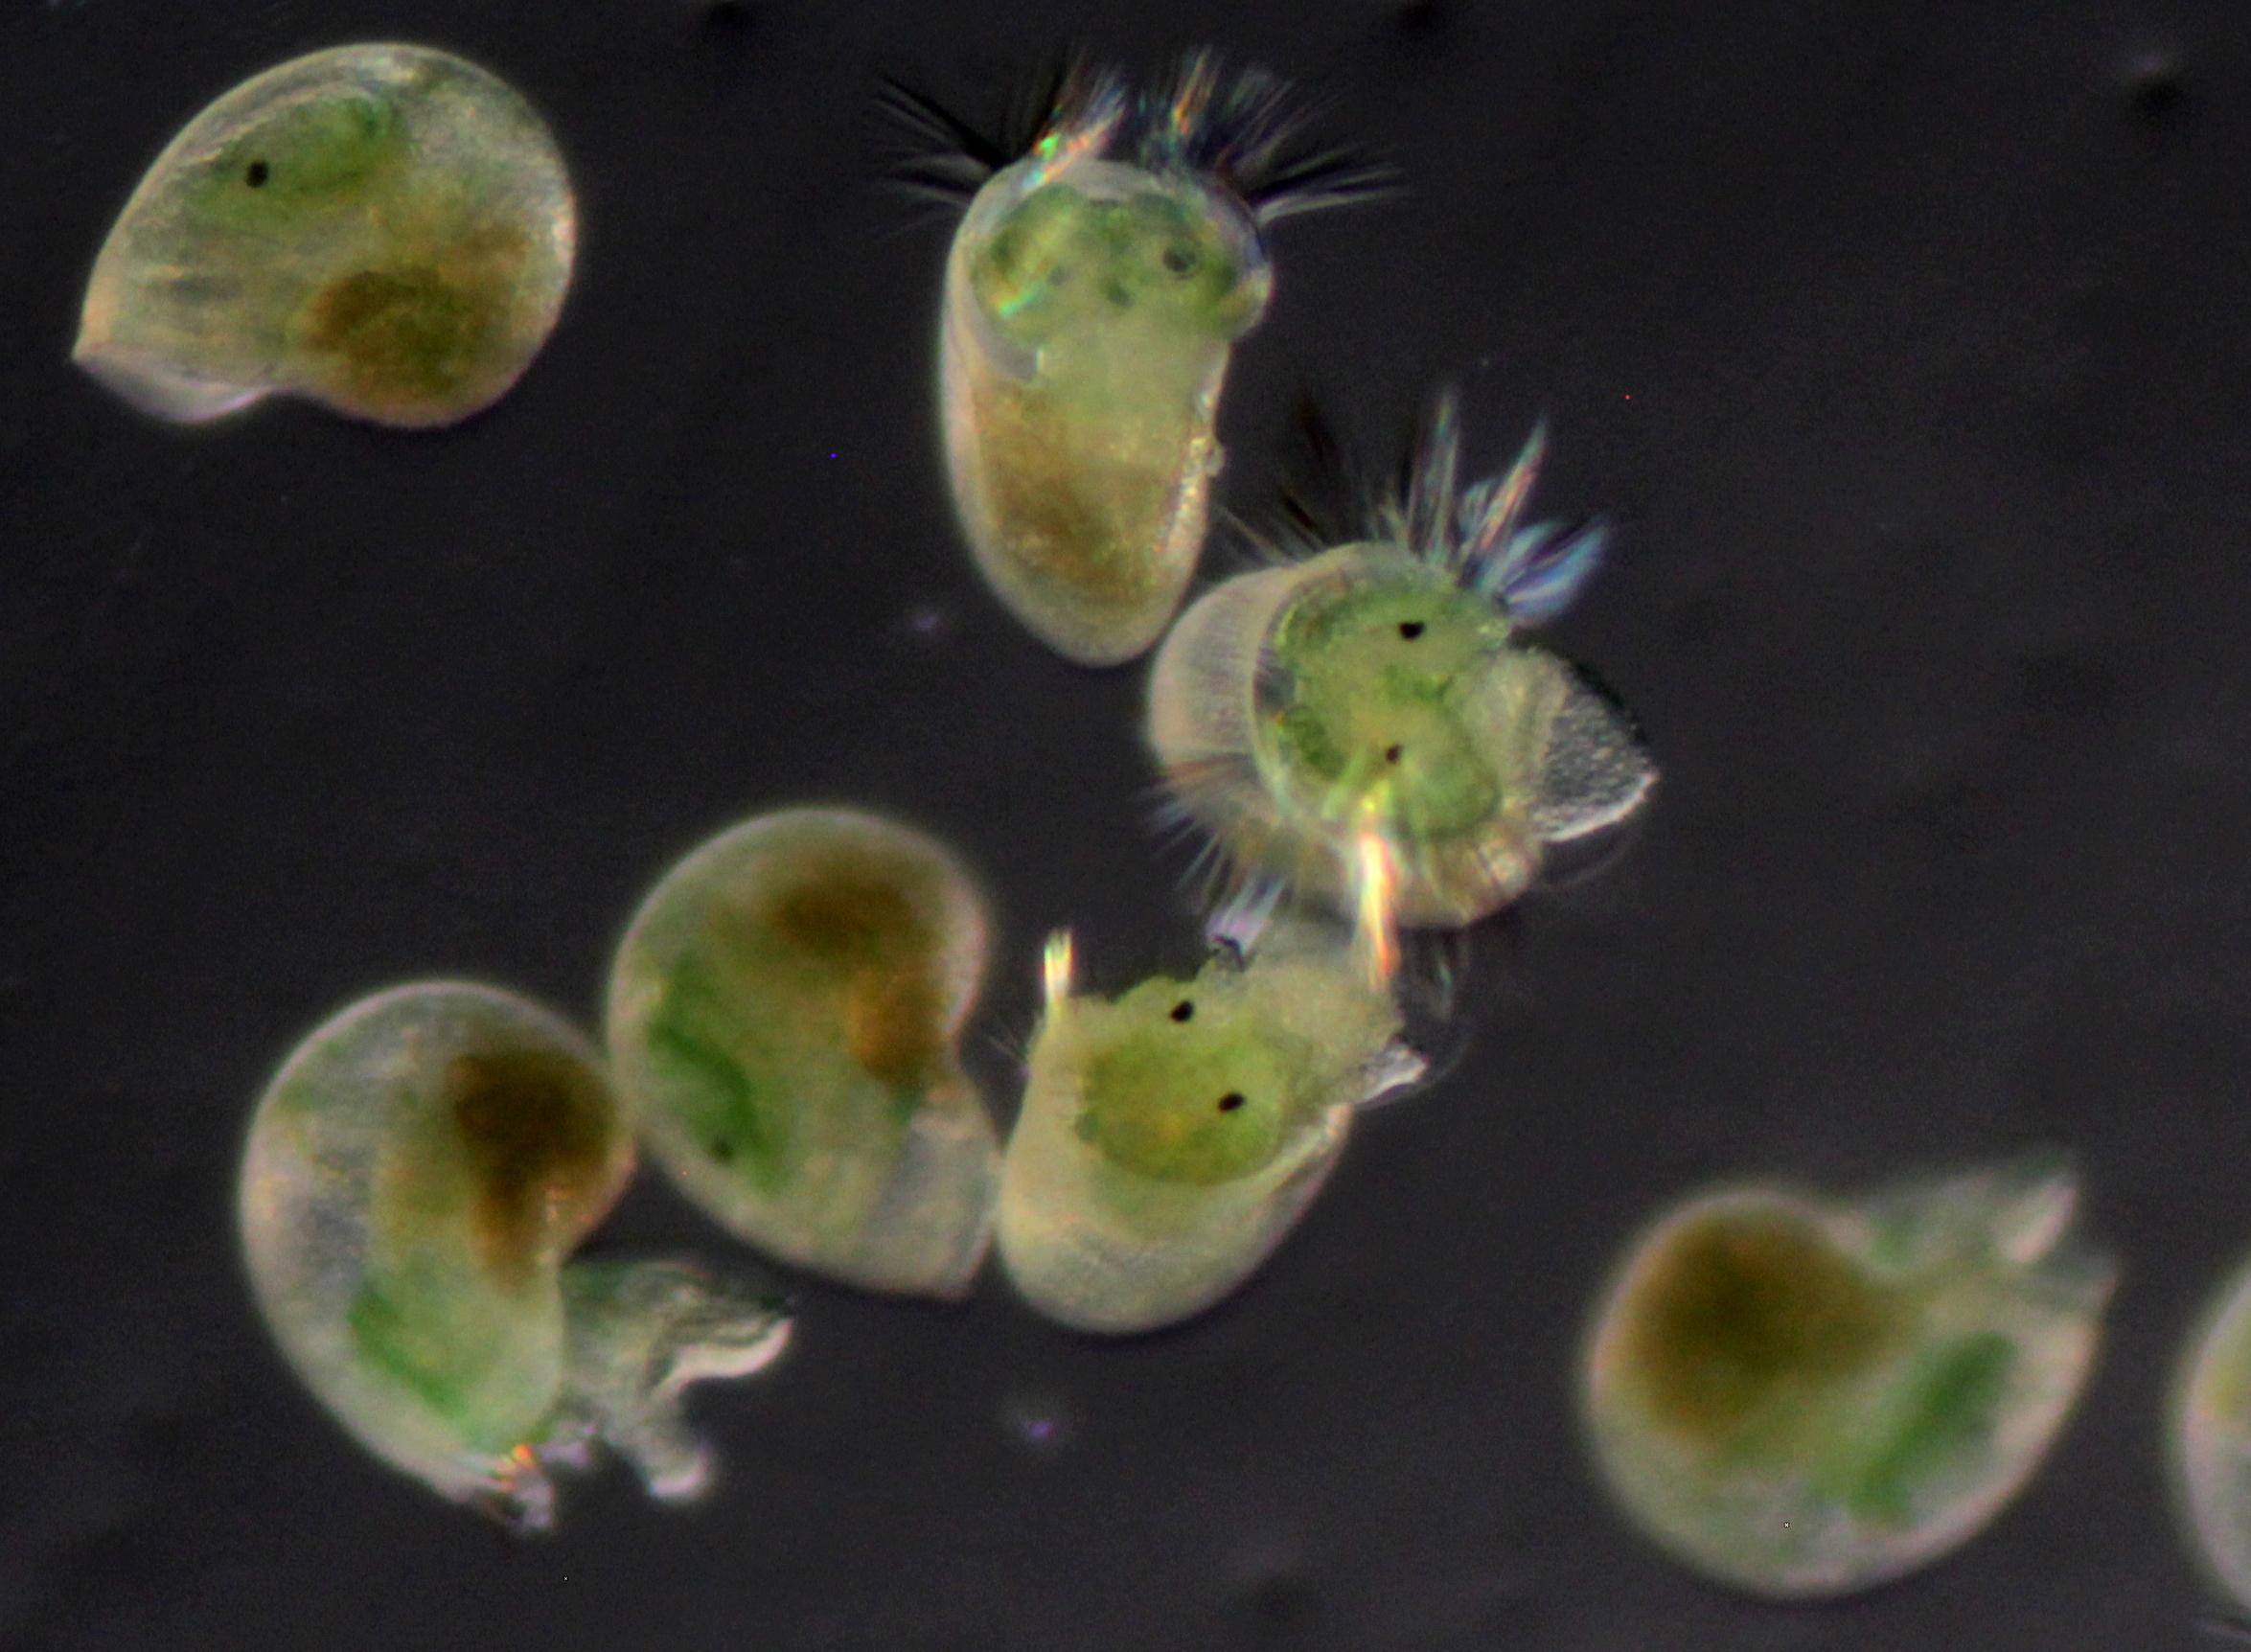 Microscopic abalone larvae